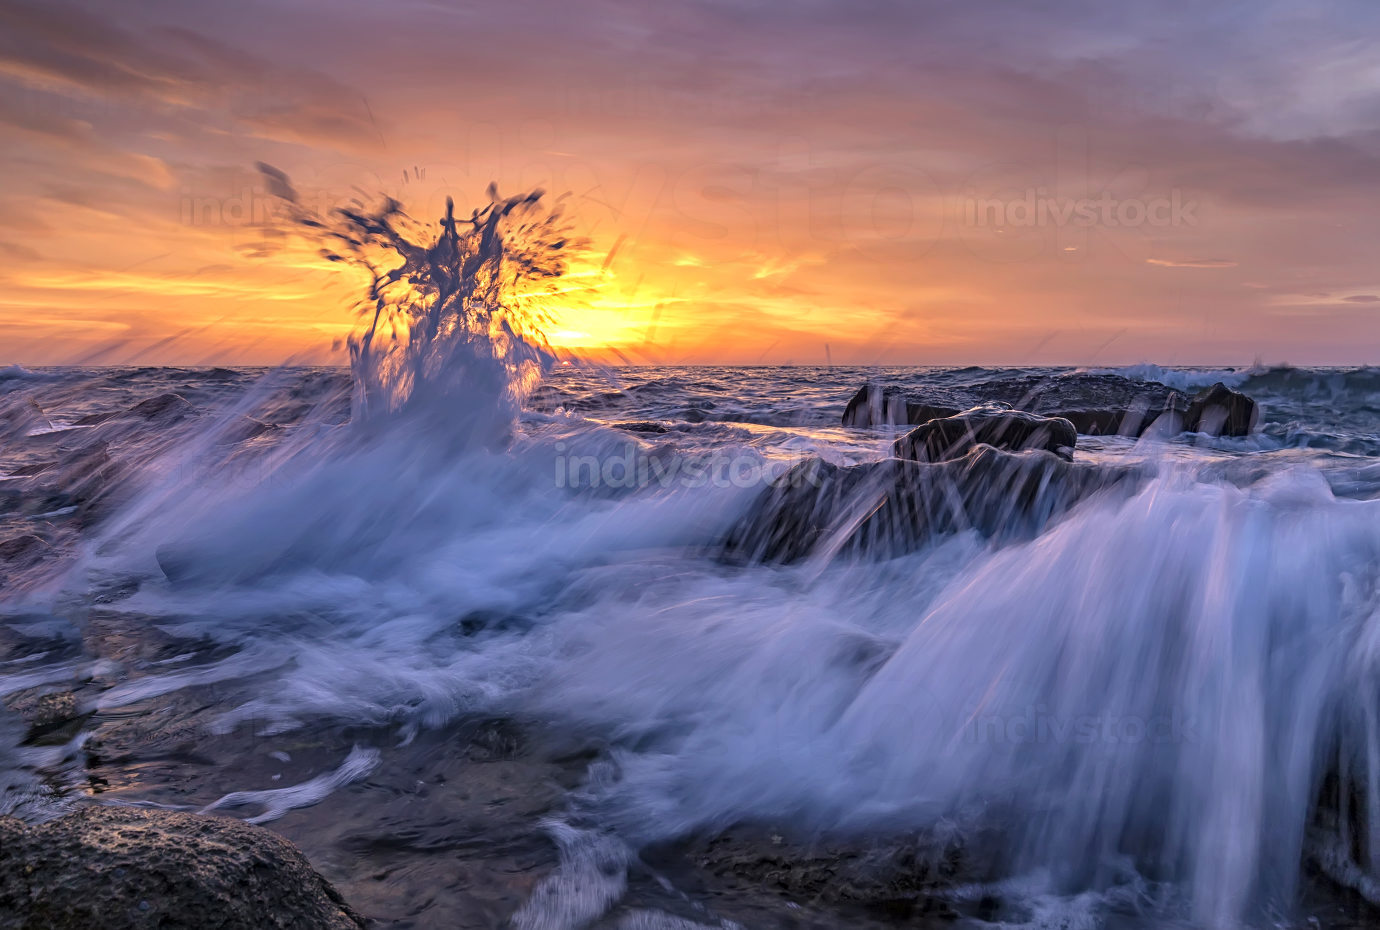 Amazing splash of seawater at sunrise on the shore of the Black